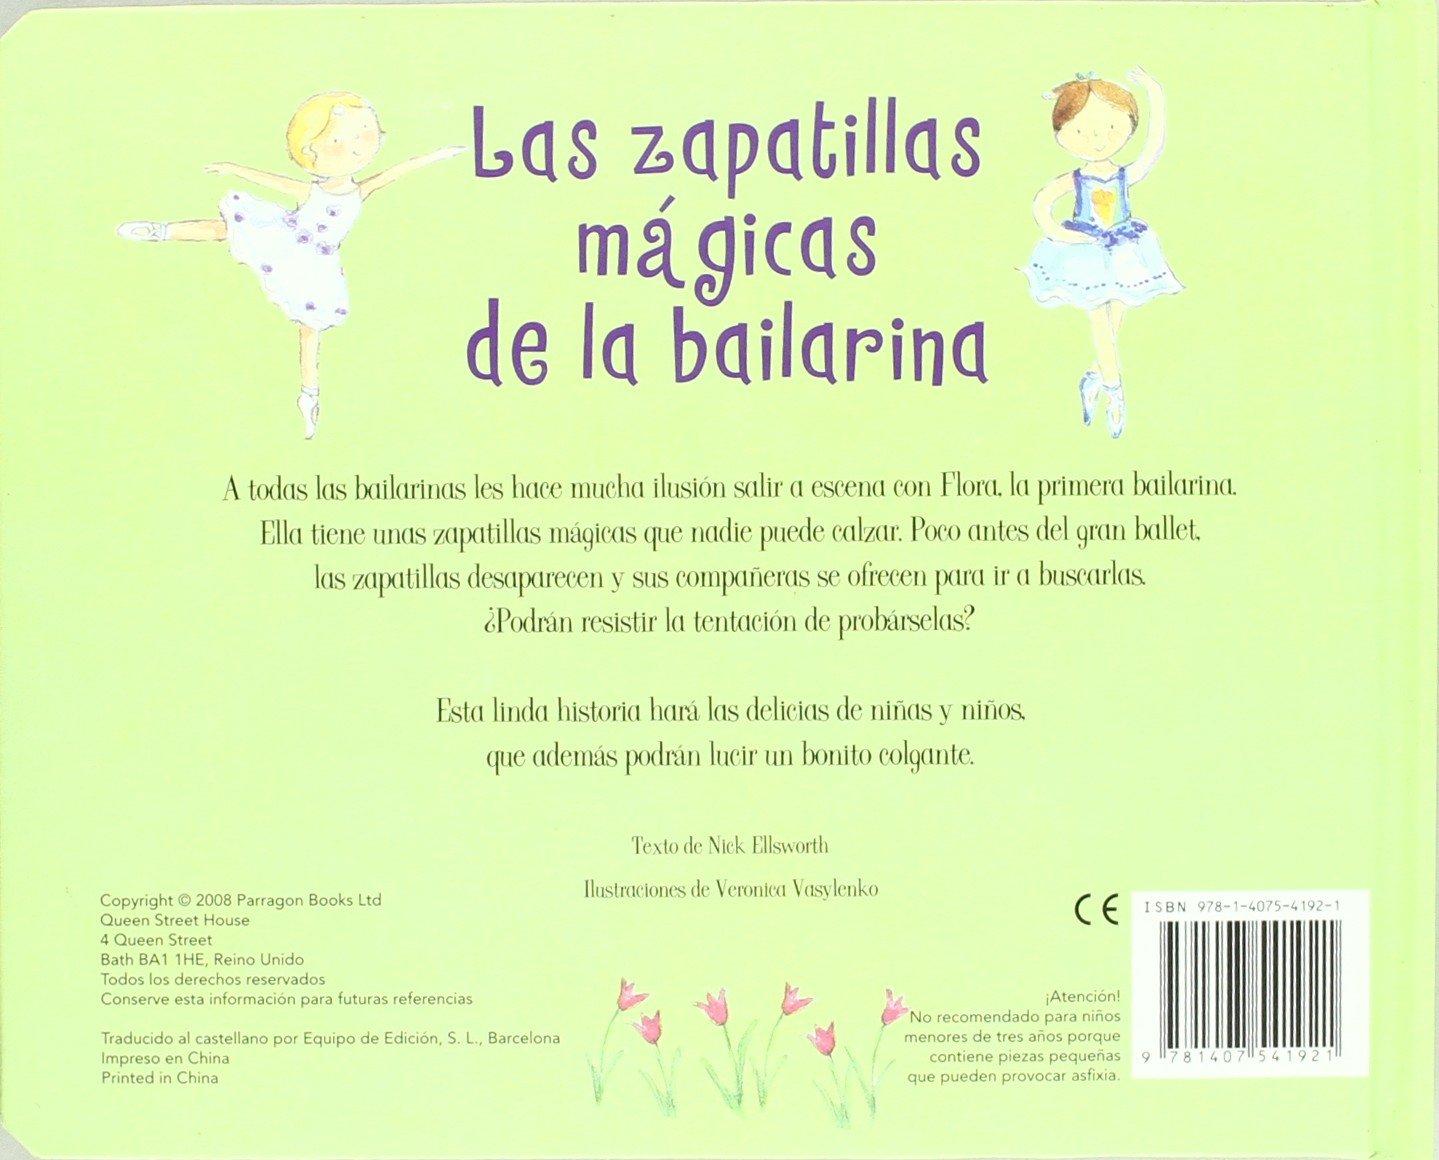 Las zapatillas magicas de la bailarina/ Ballerina (Cased Charm Books) (Spanish Edition): Nick Ellsworth, Veronica Vaslenko: 9781407541921: Amazon.com: Books